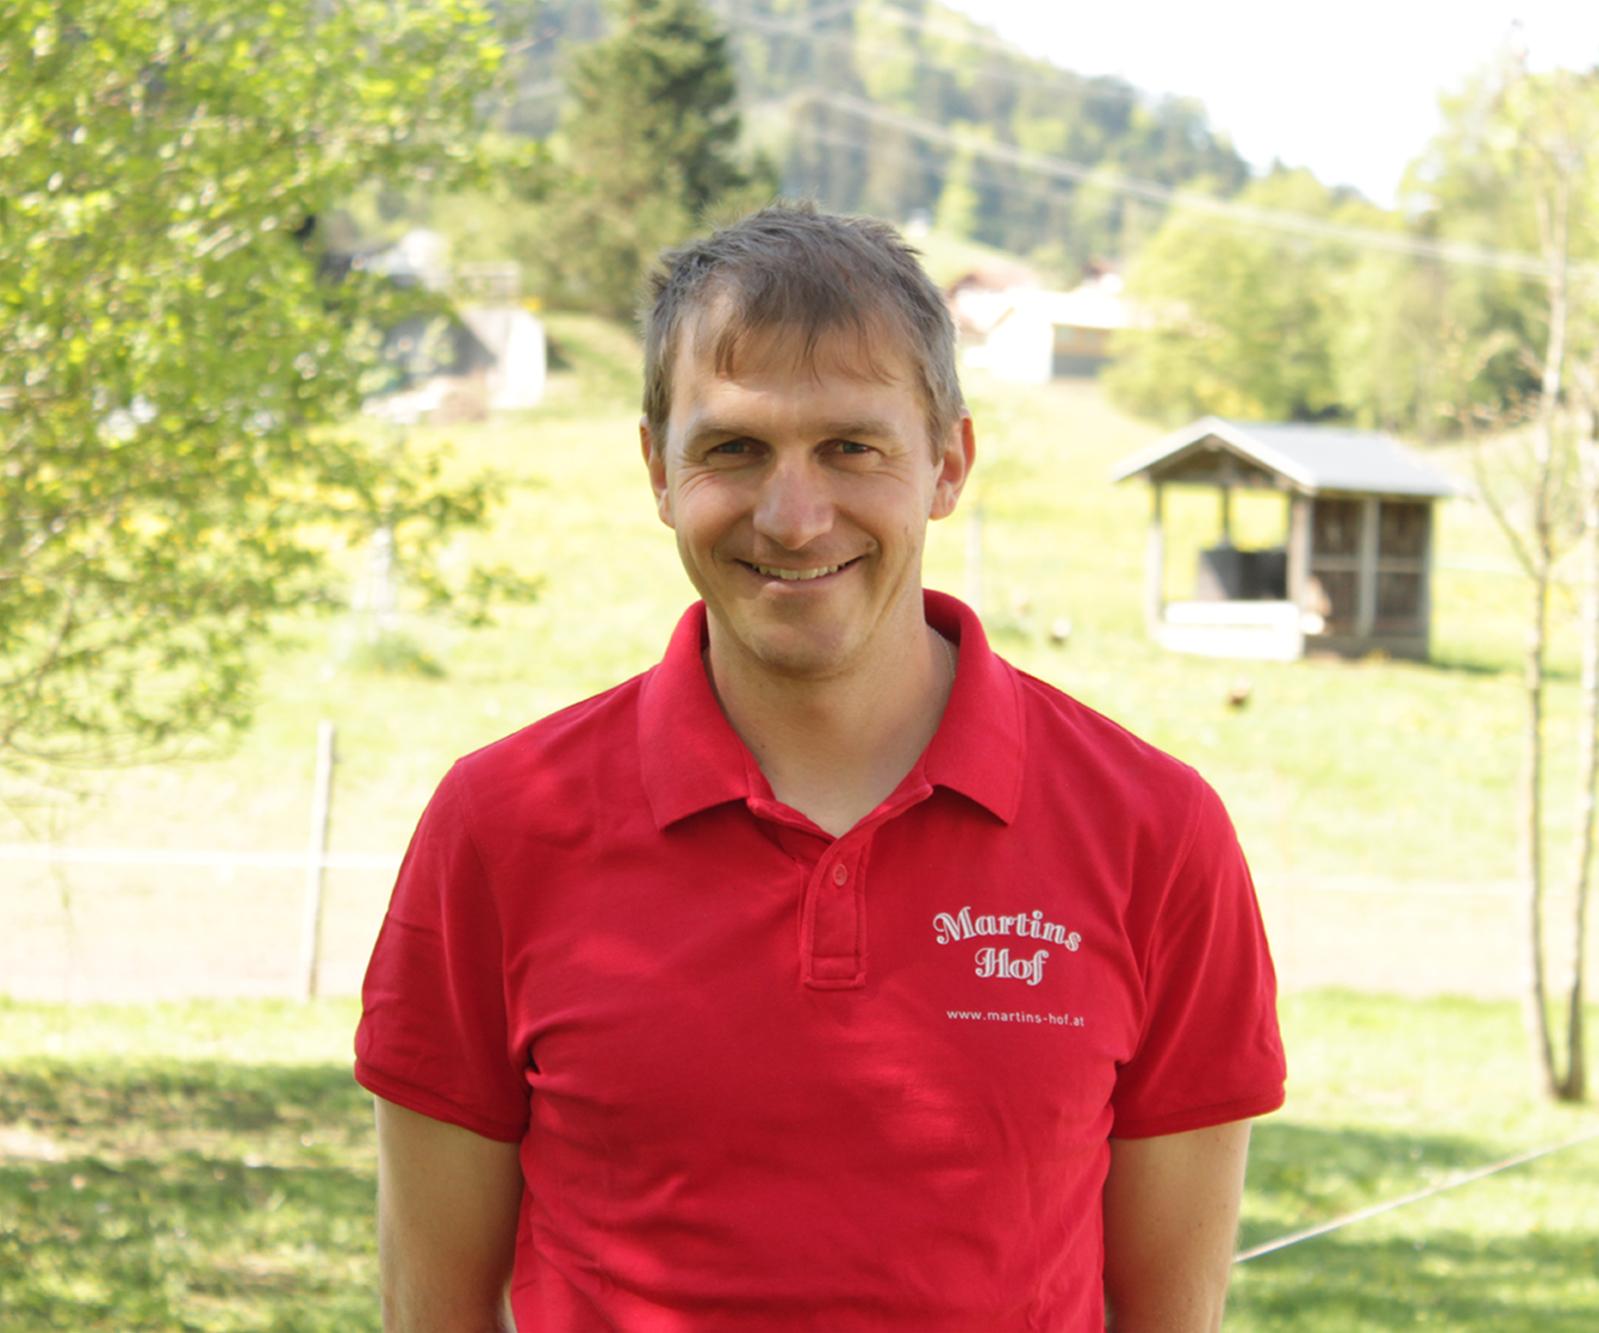 Ronald Eberle